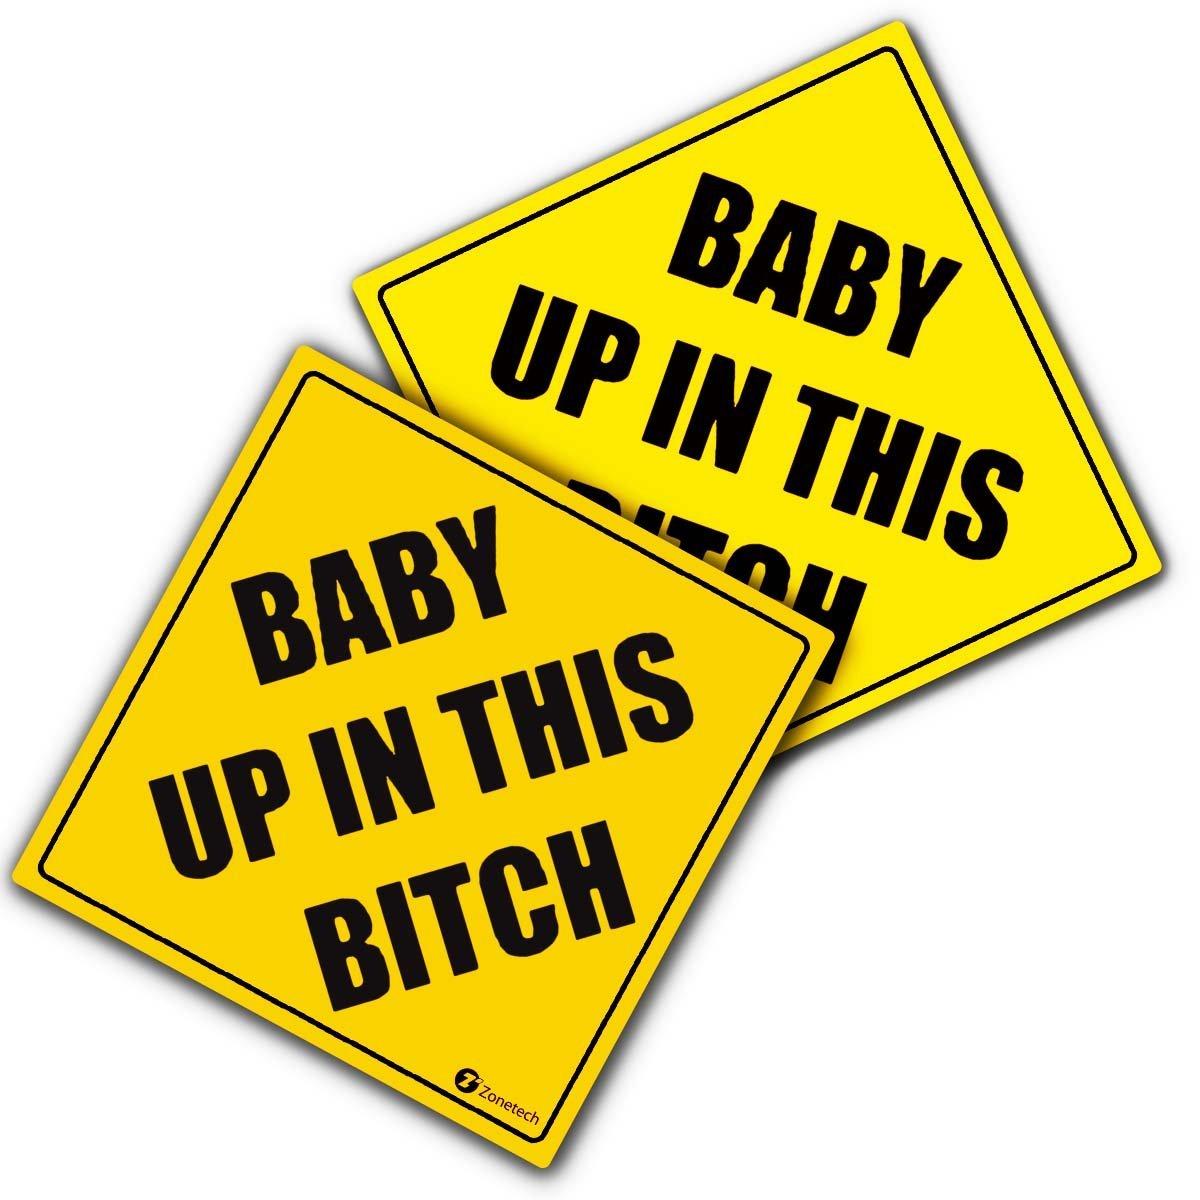 "Zone Tech ""Baby Up in This Bitch Vehicle Safety Sticker - 2-Pack Premium Quality Convenient Reflective Baby Up On This Bitch Vehicle Safety Funny Sign Sticker"